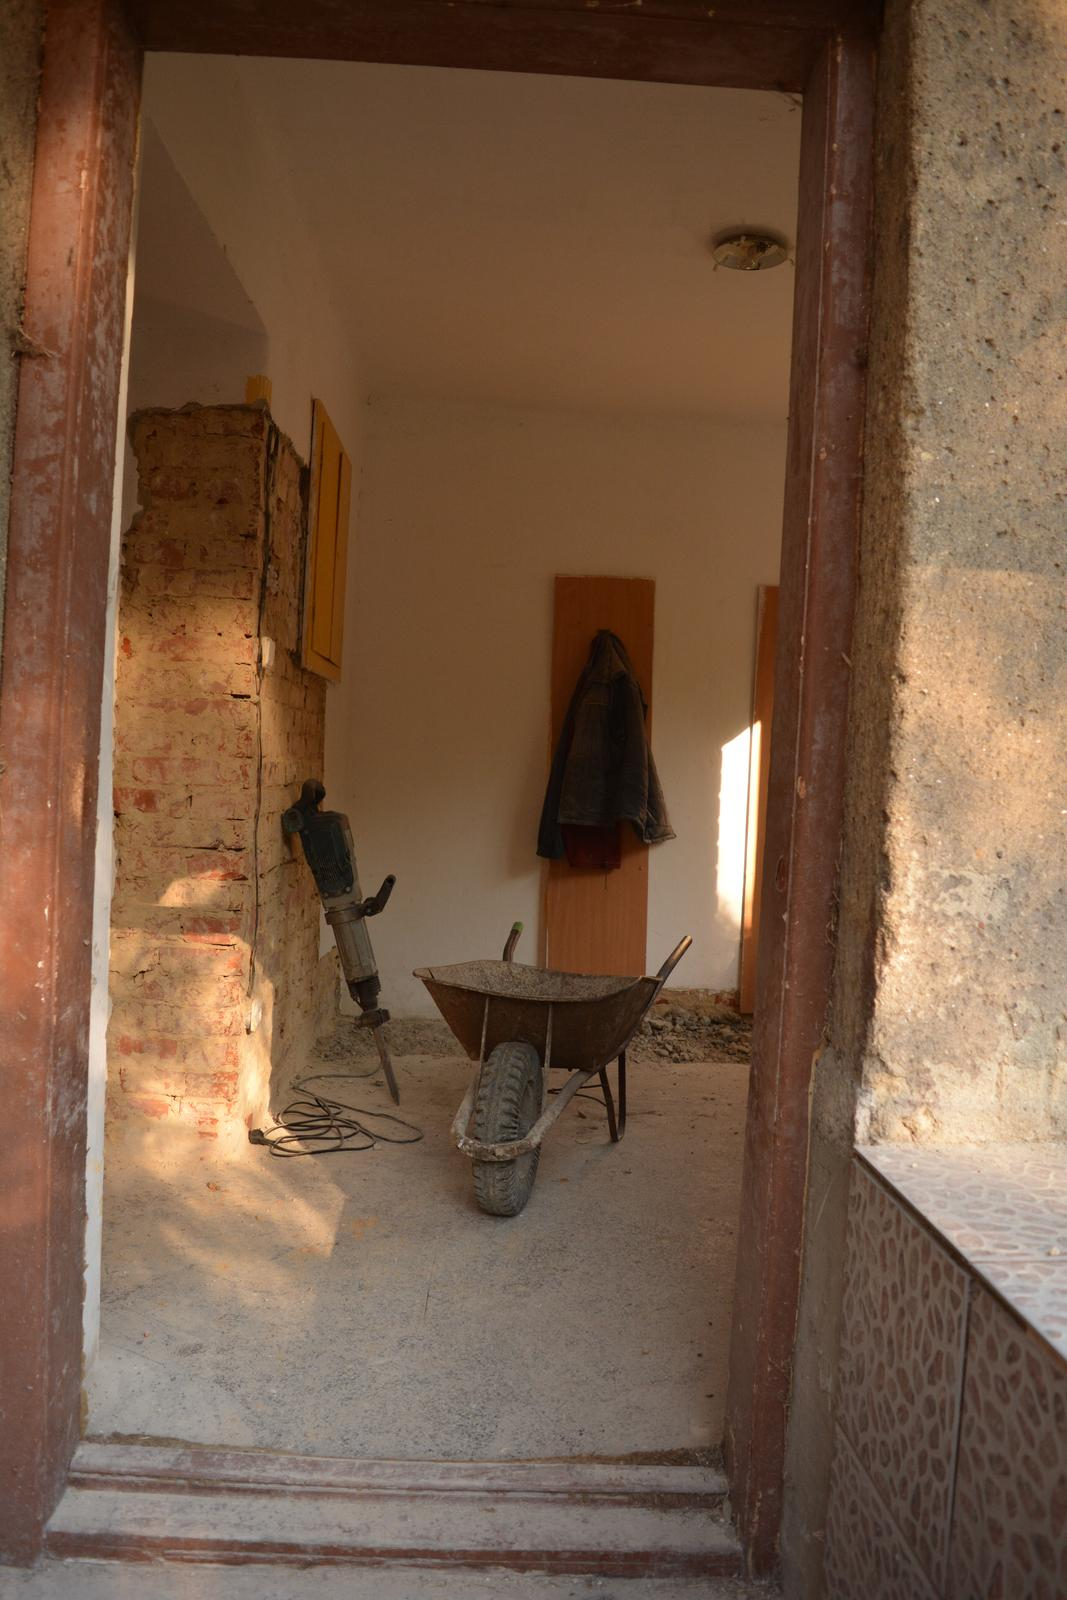 Náš nový domov ... - Vypůjčená zbíječka a valíme podlahy ....